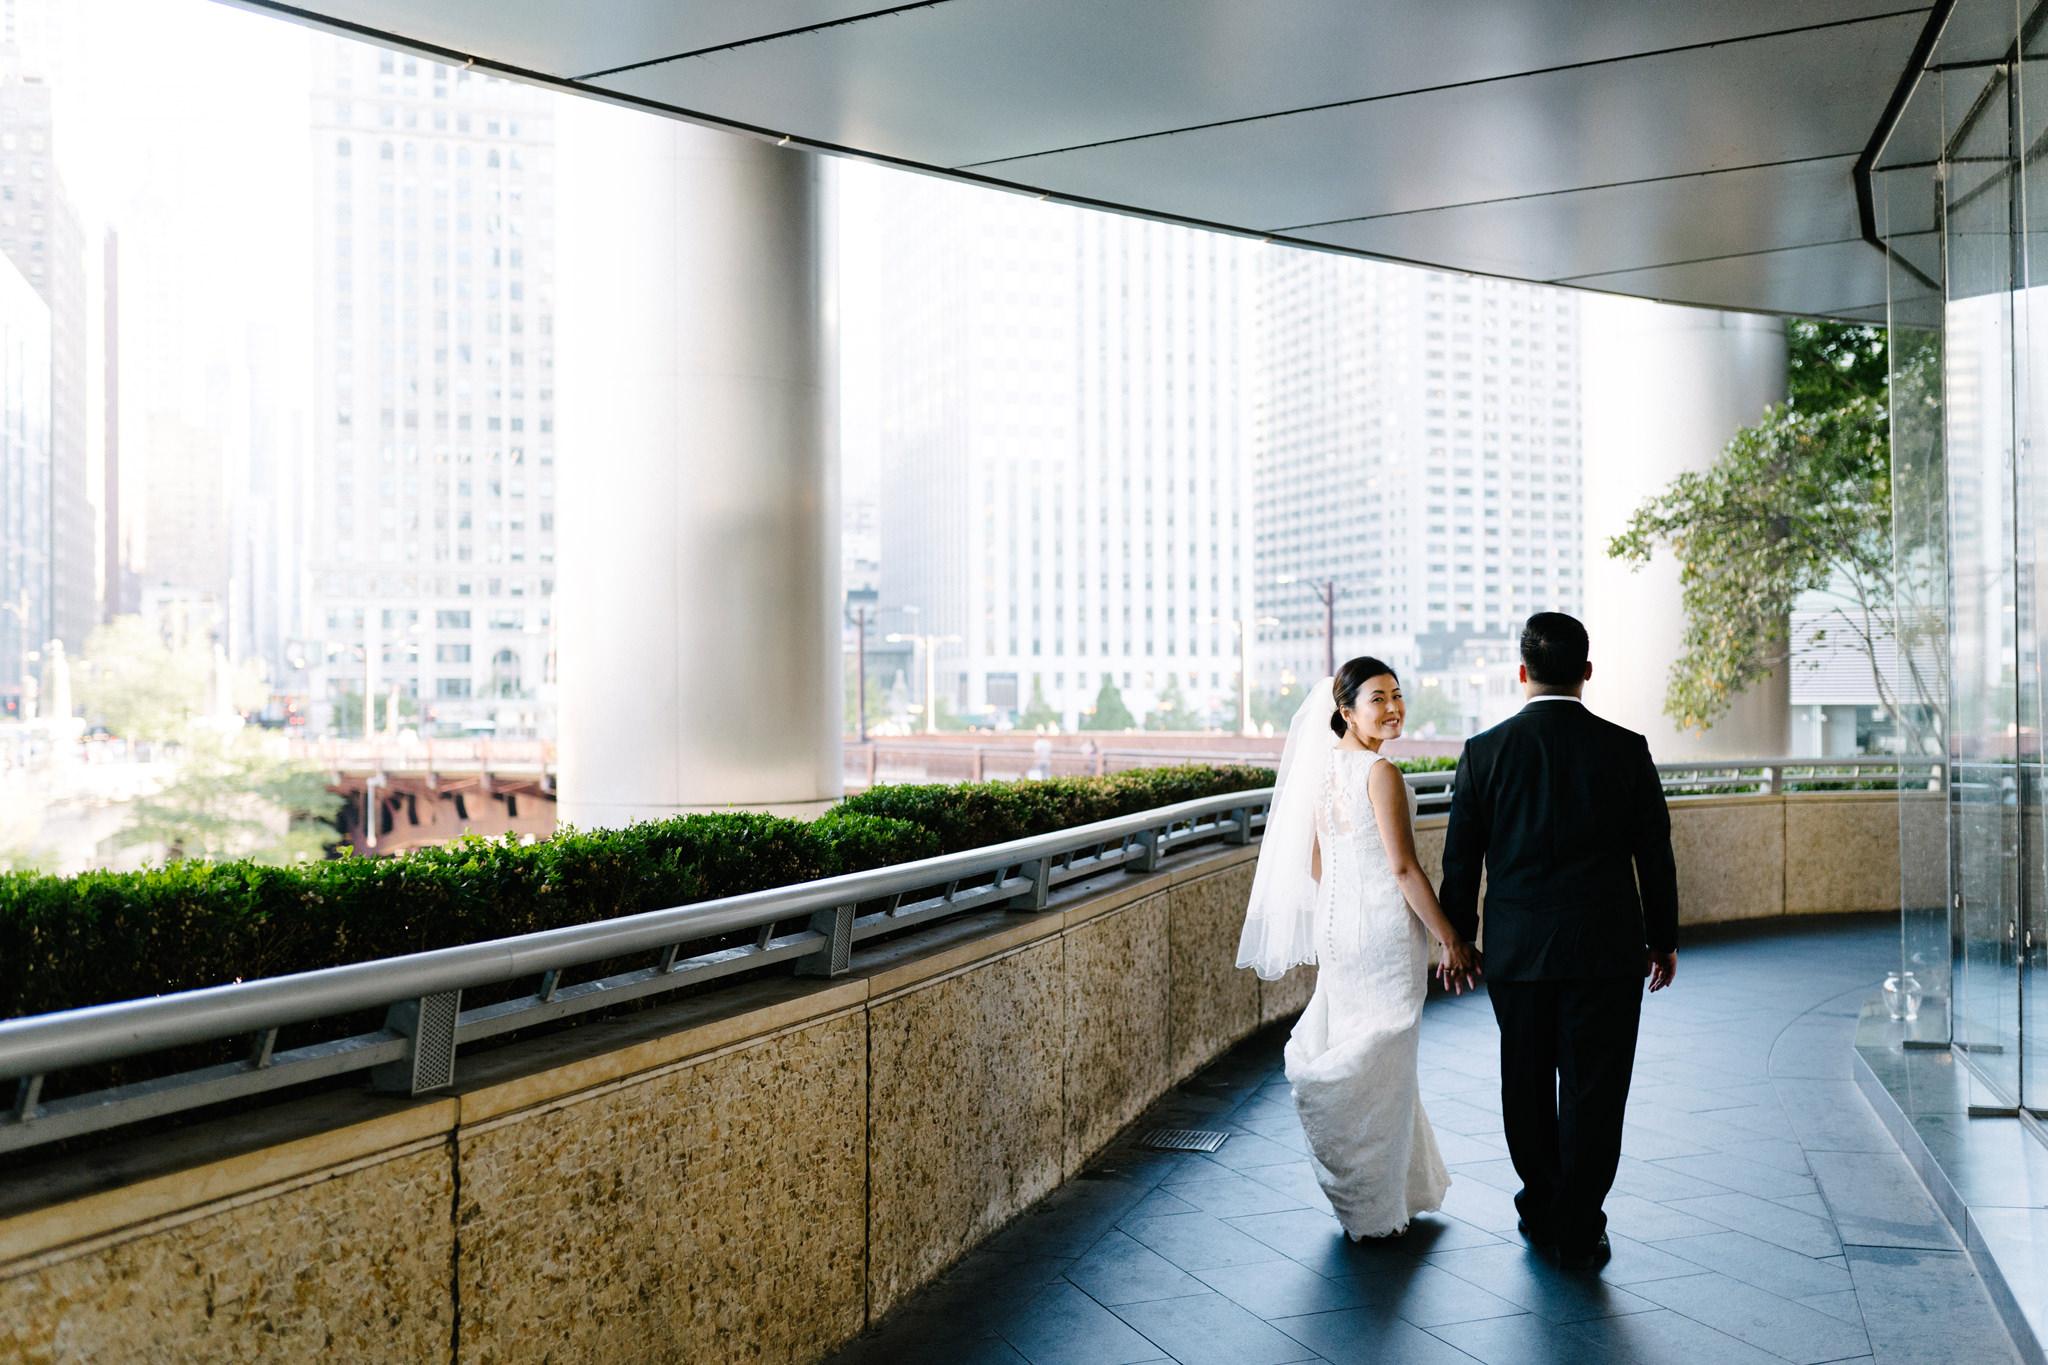 031-rempel-photography-chicago-wedding-inspiration-sara-philip-rockefeller-chapel-trump-tower.jpg